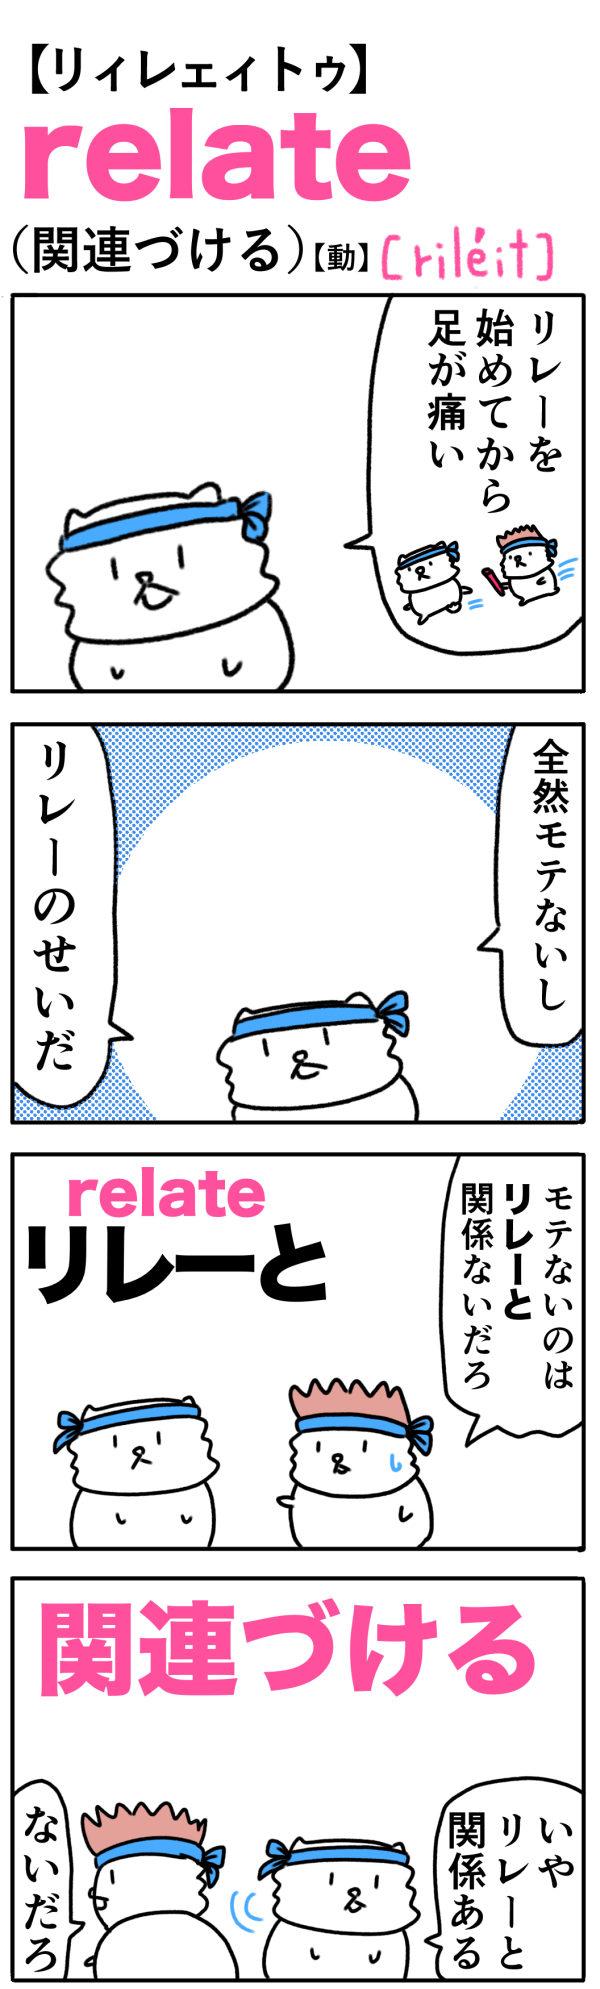 relate(関連づける)の語呂合わせ英単語